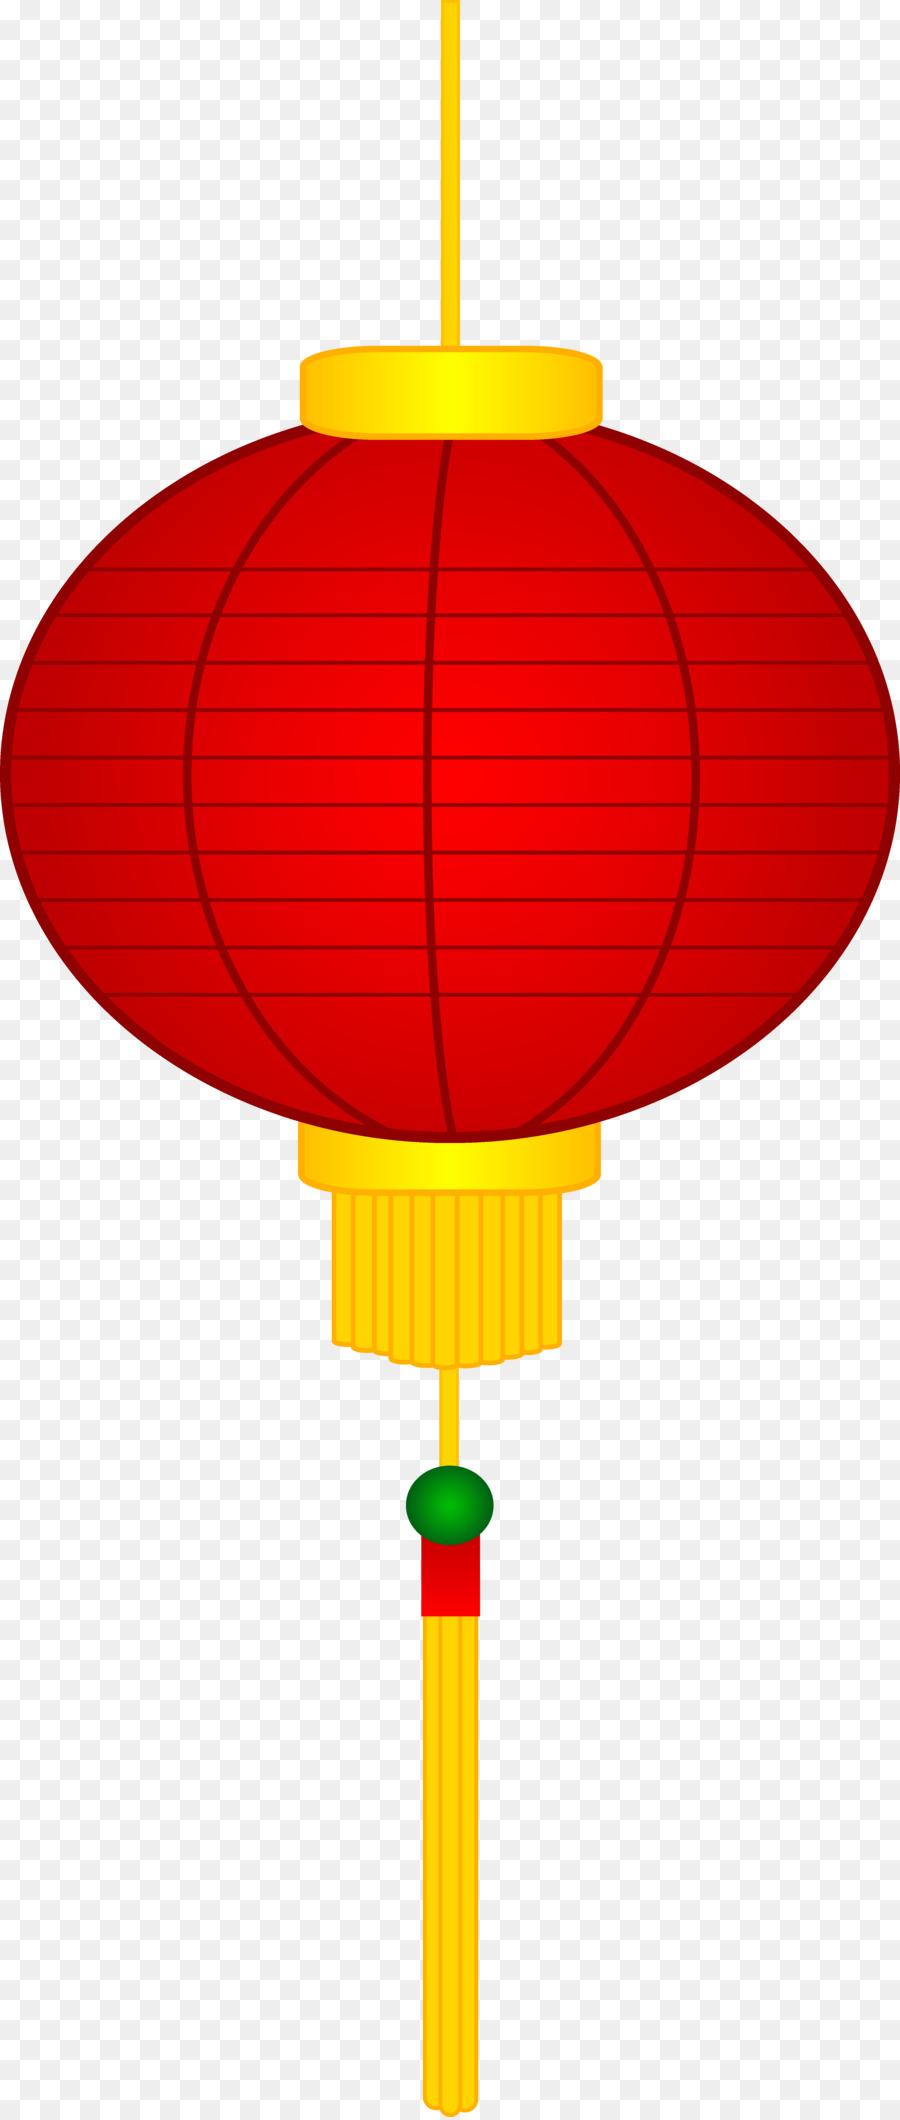 chinese new year sky lantern clip art free chinese new year rh kisspng com free chinese new year cliparts for 2018 Free Clip Art Chinese New Year 2018